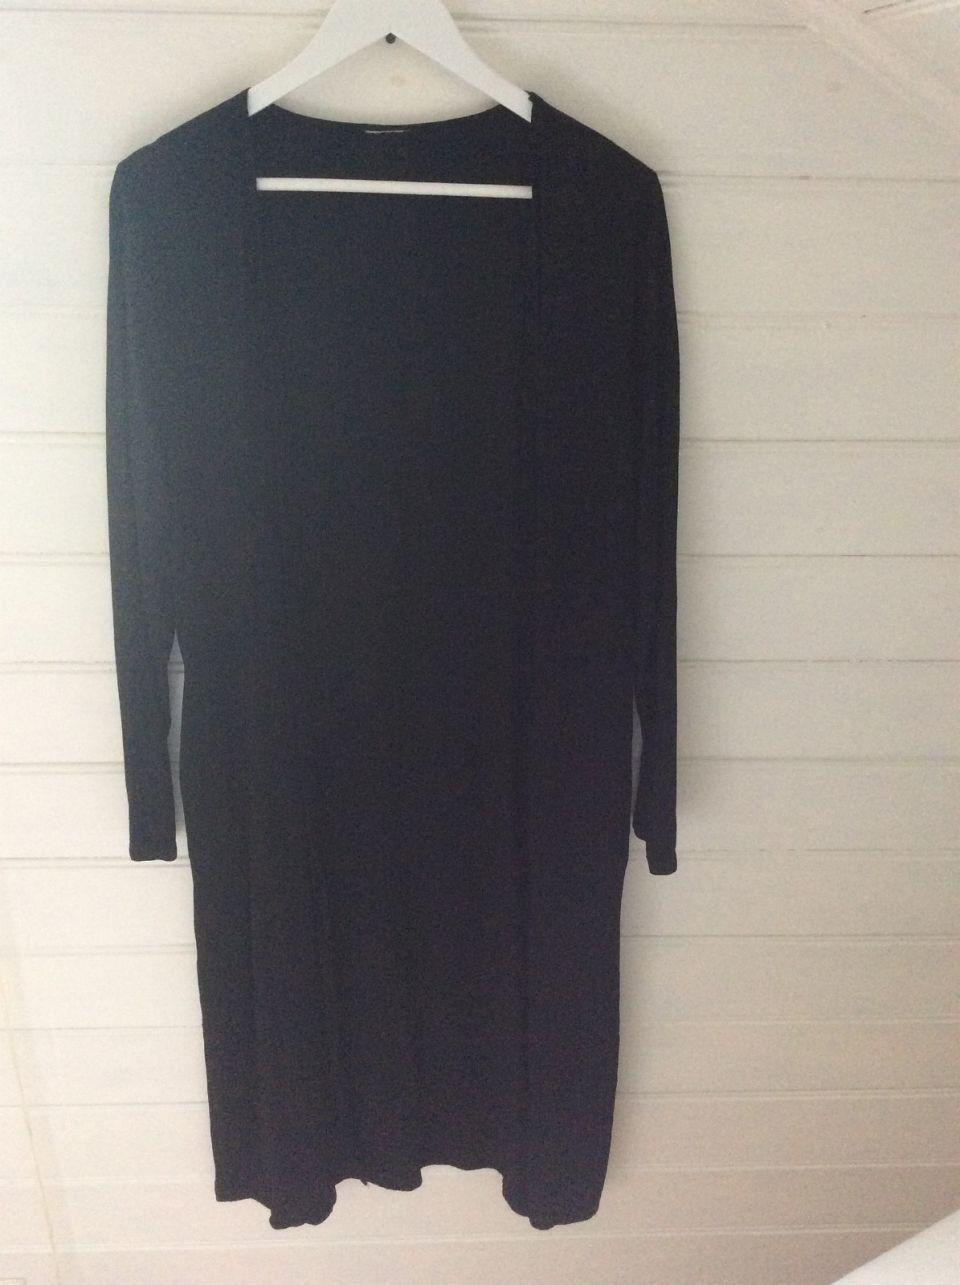 dec678b3 Klassisk lang jakke / trenchcoat / kåpe i sort / svart | FINN.no